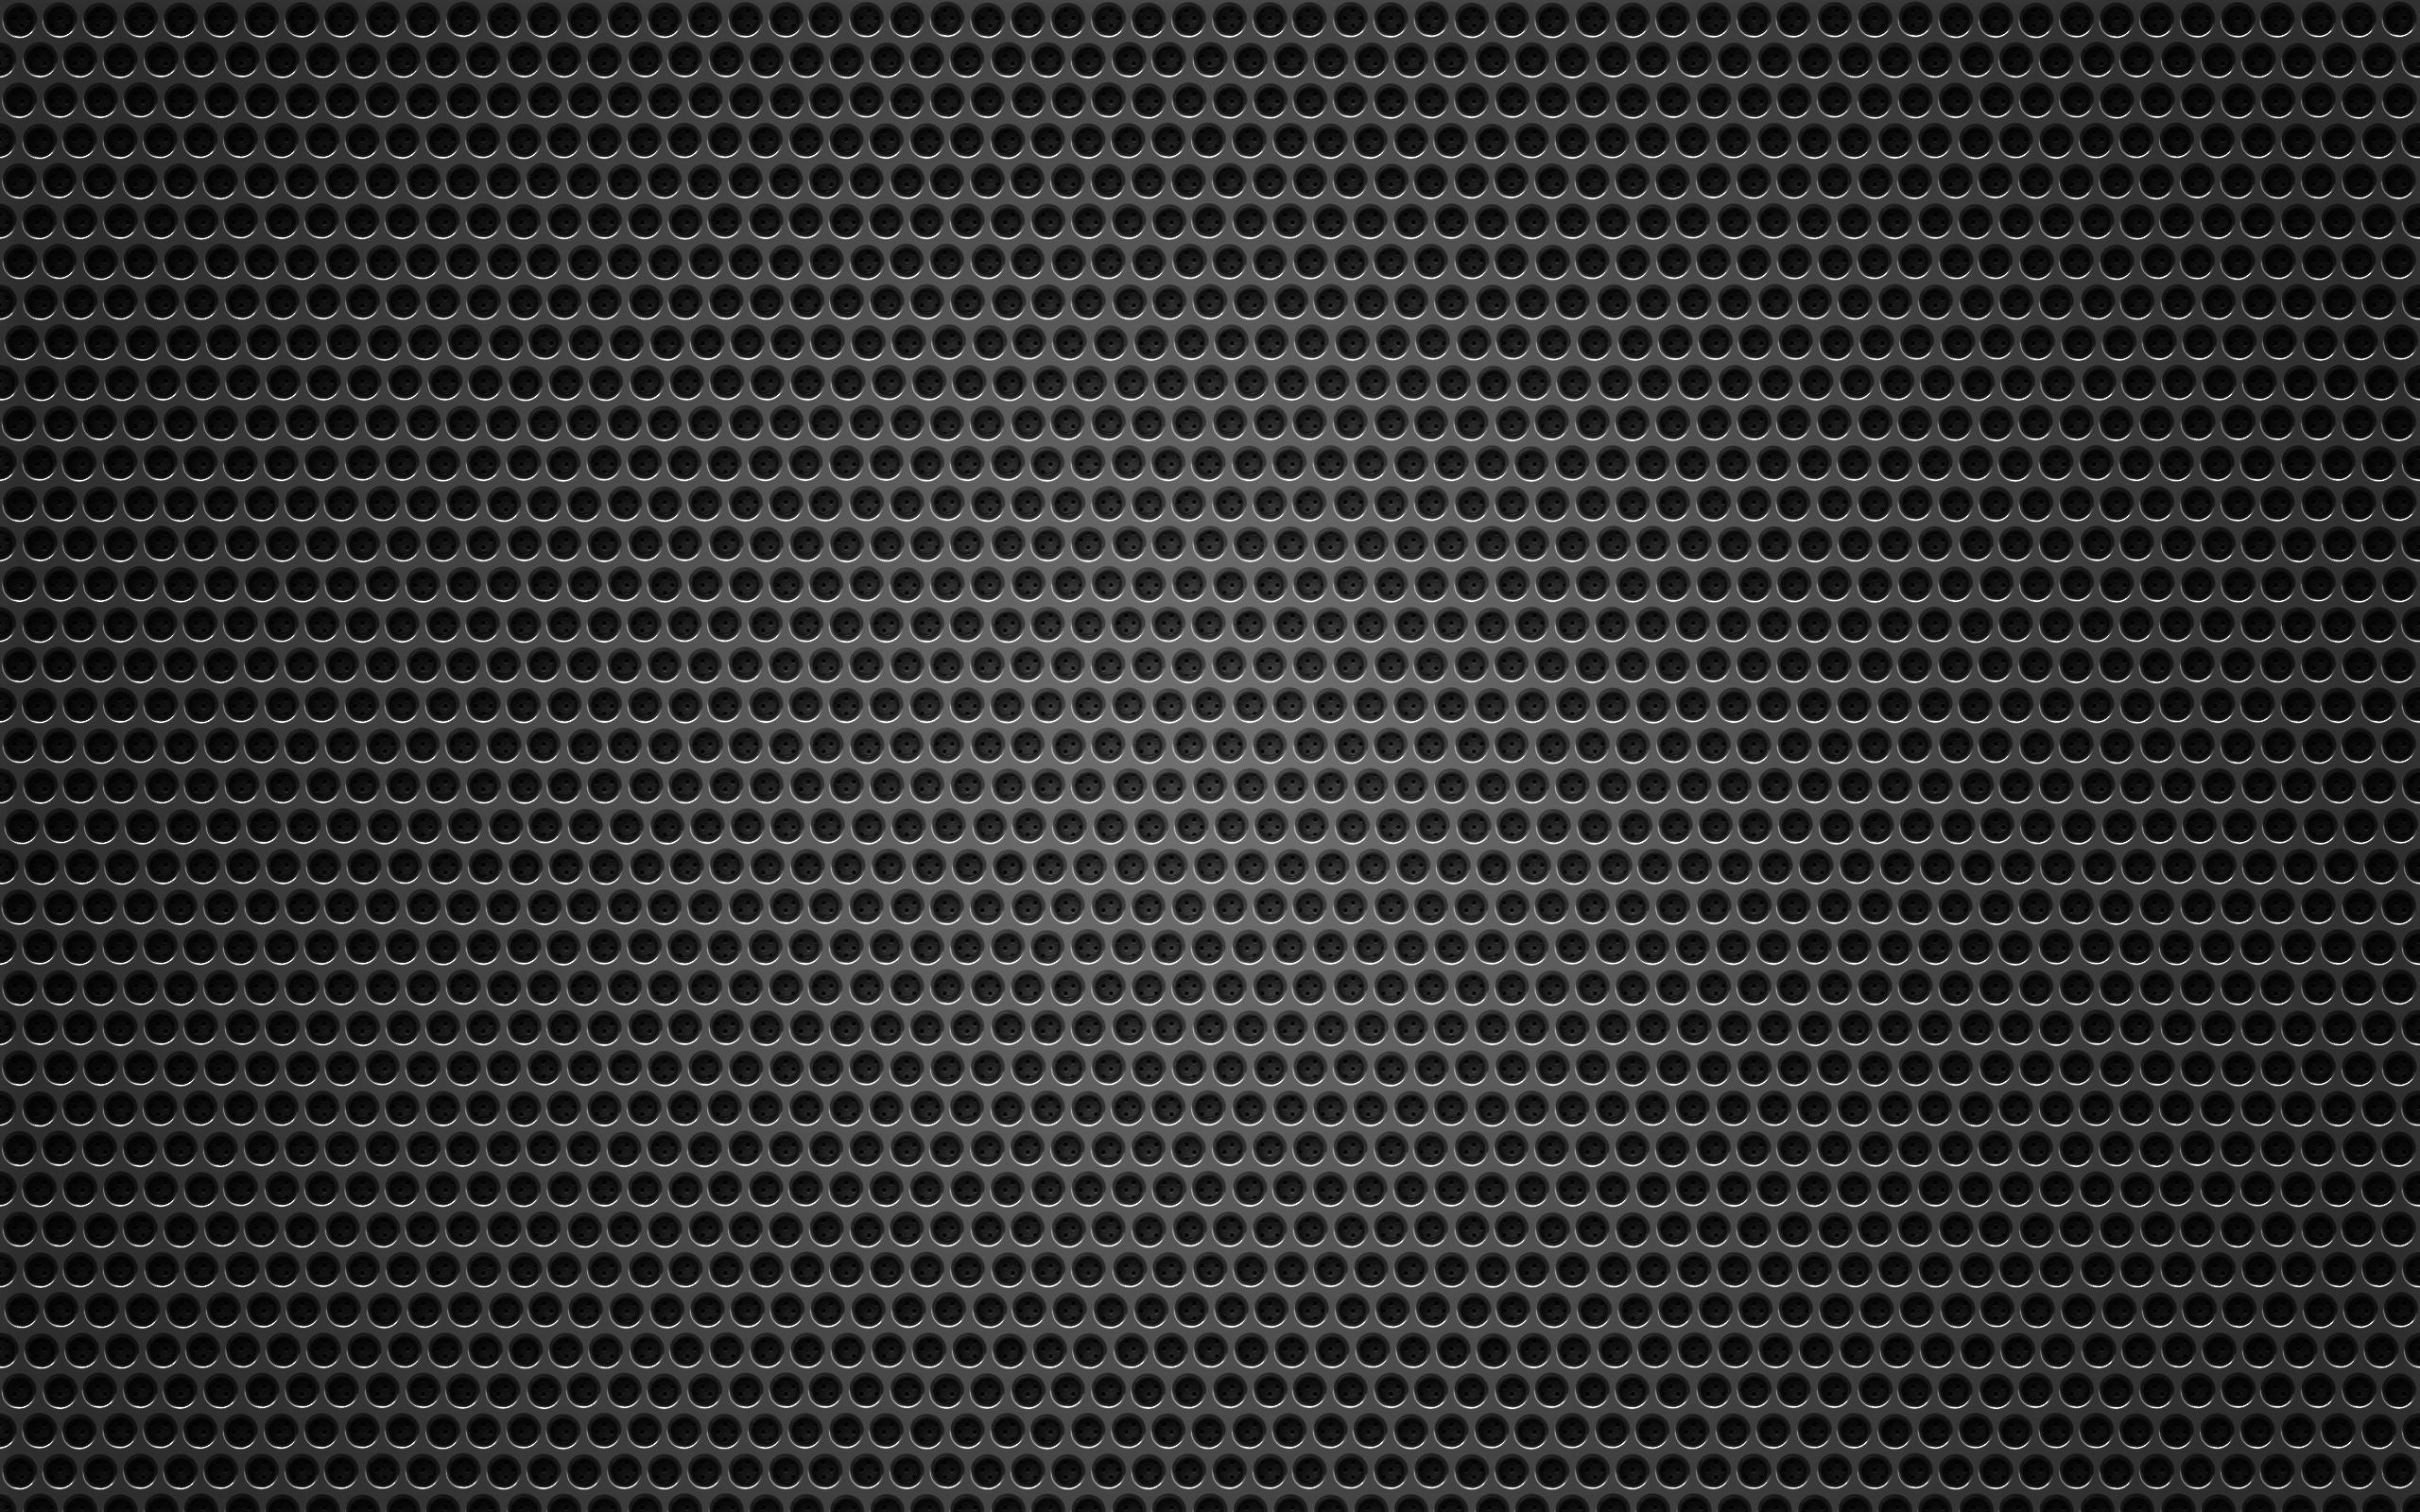 Free Photo: Metal Pattern Background